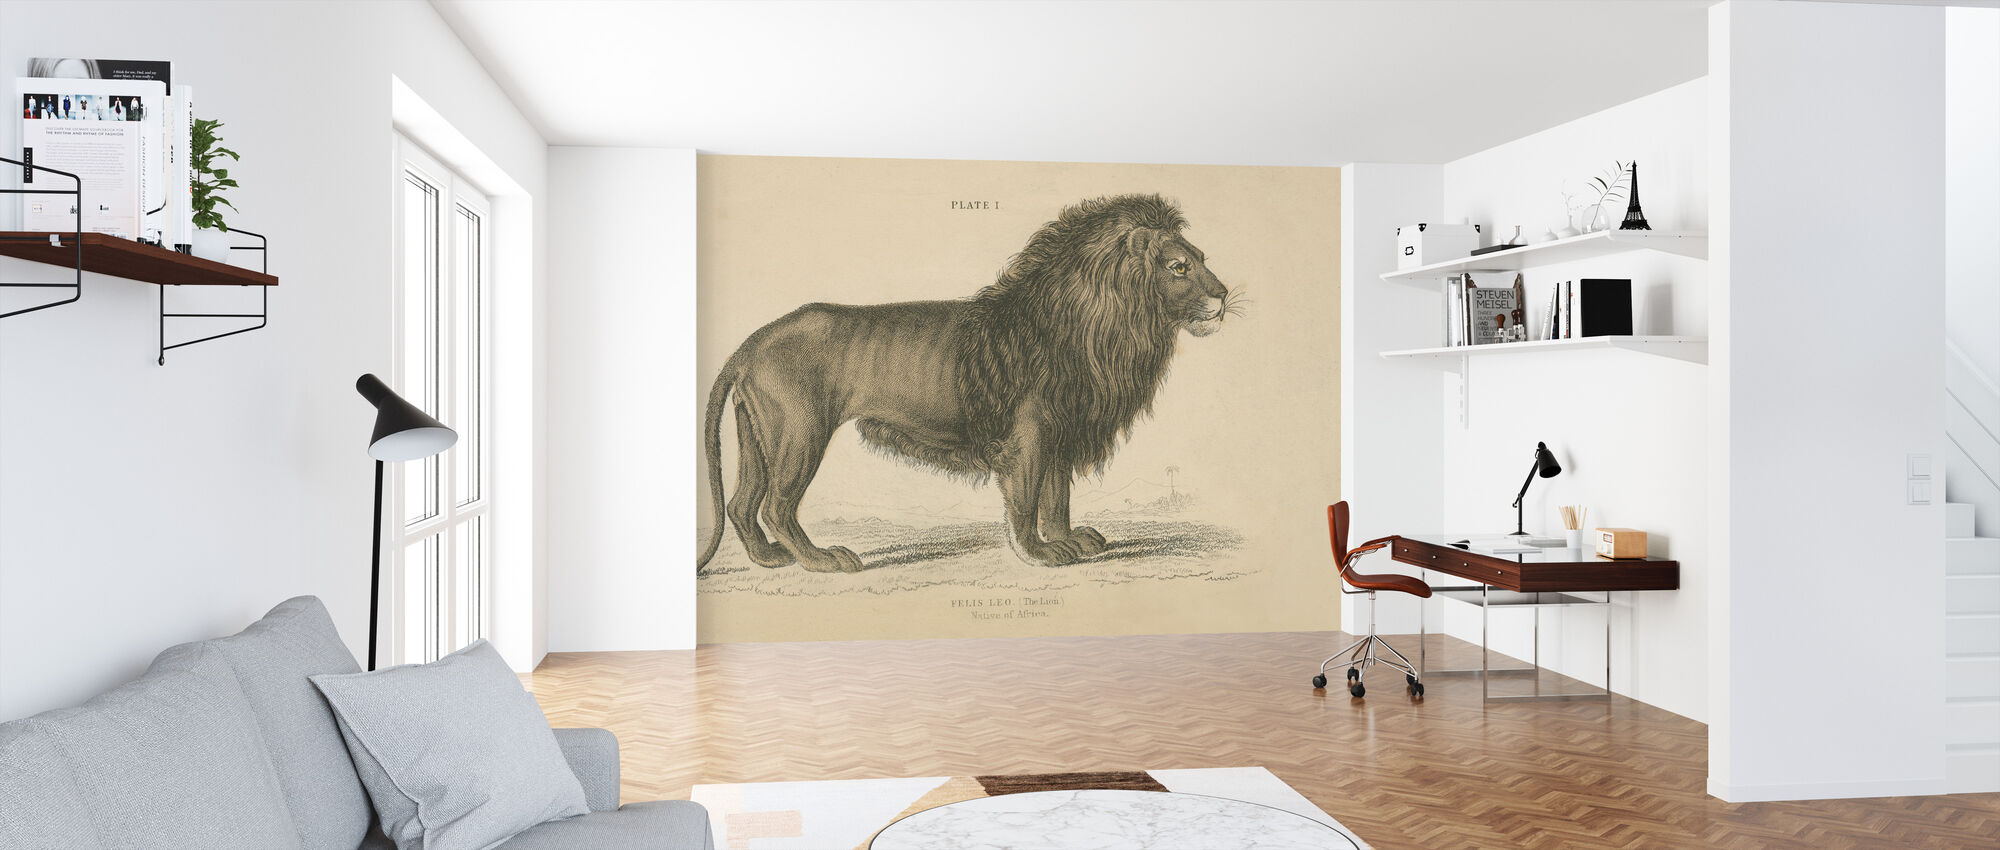 Vintage Lion - Wallpaper - Office